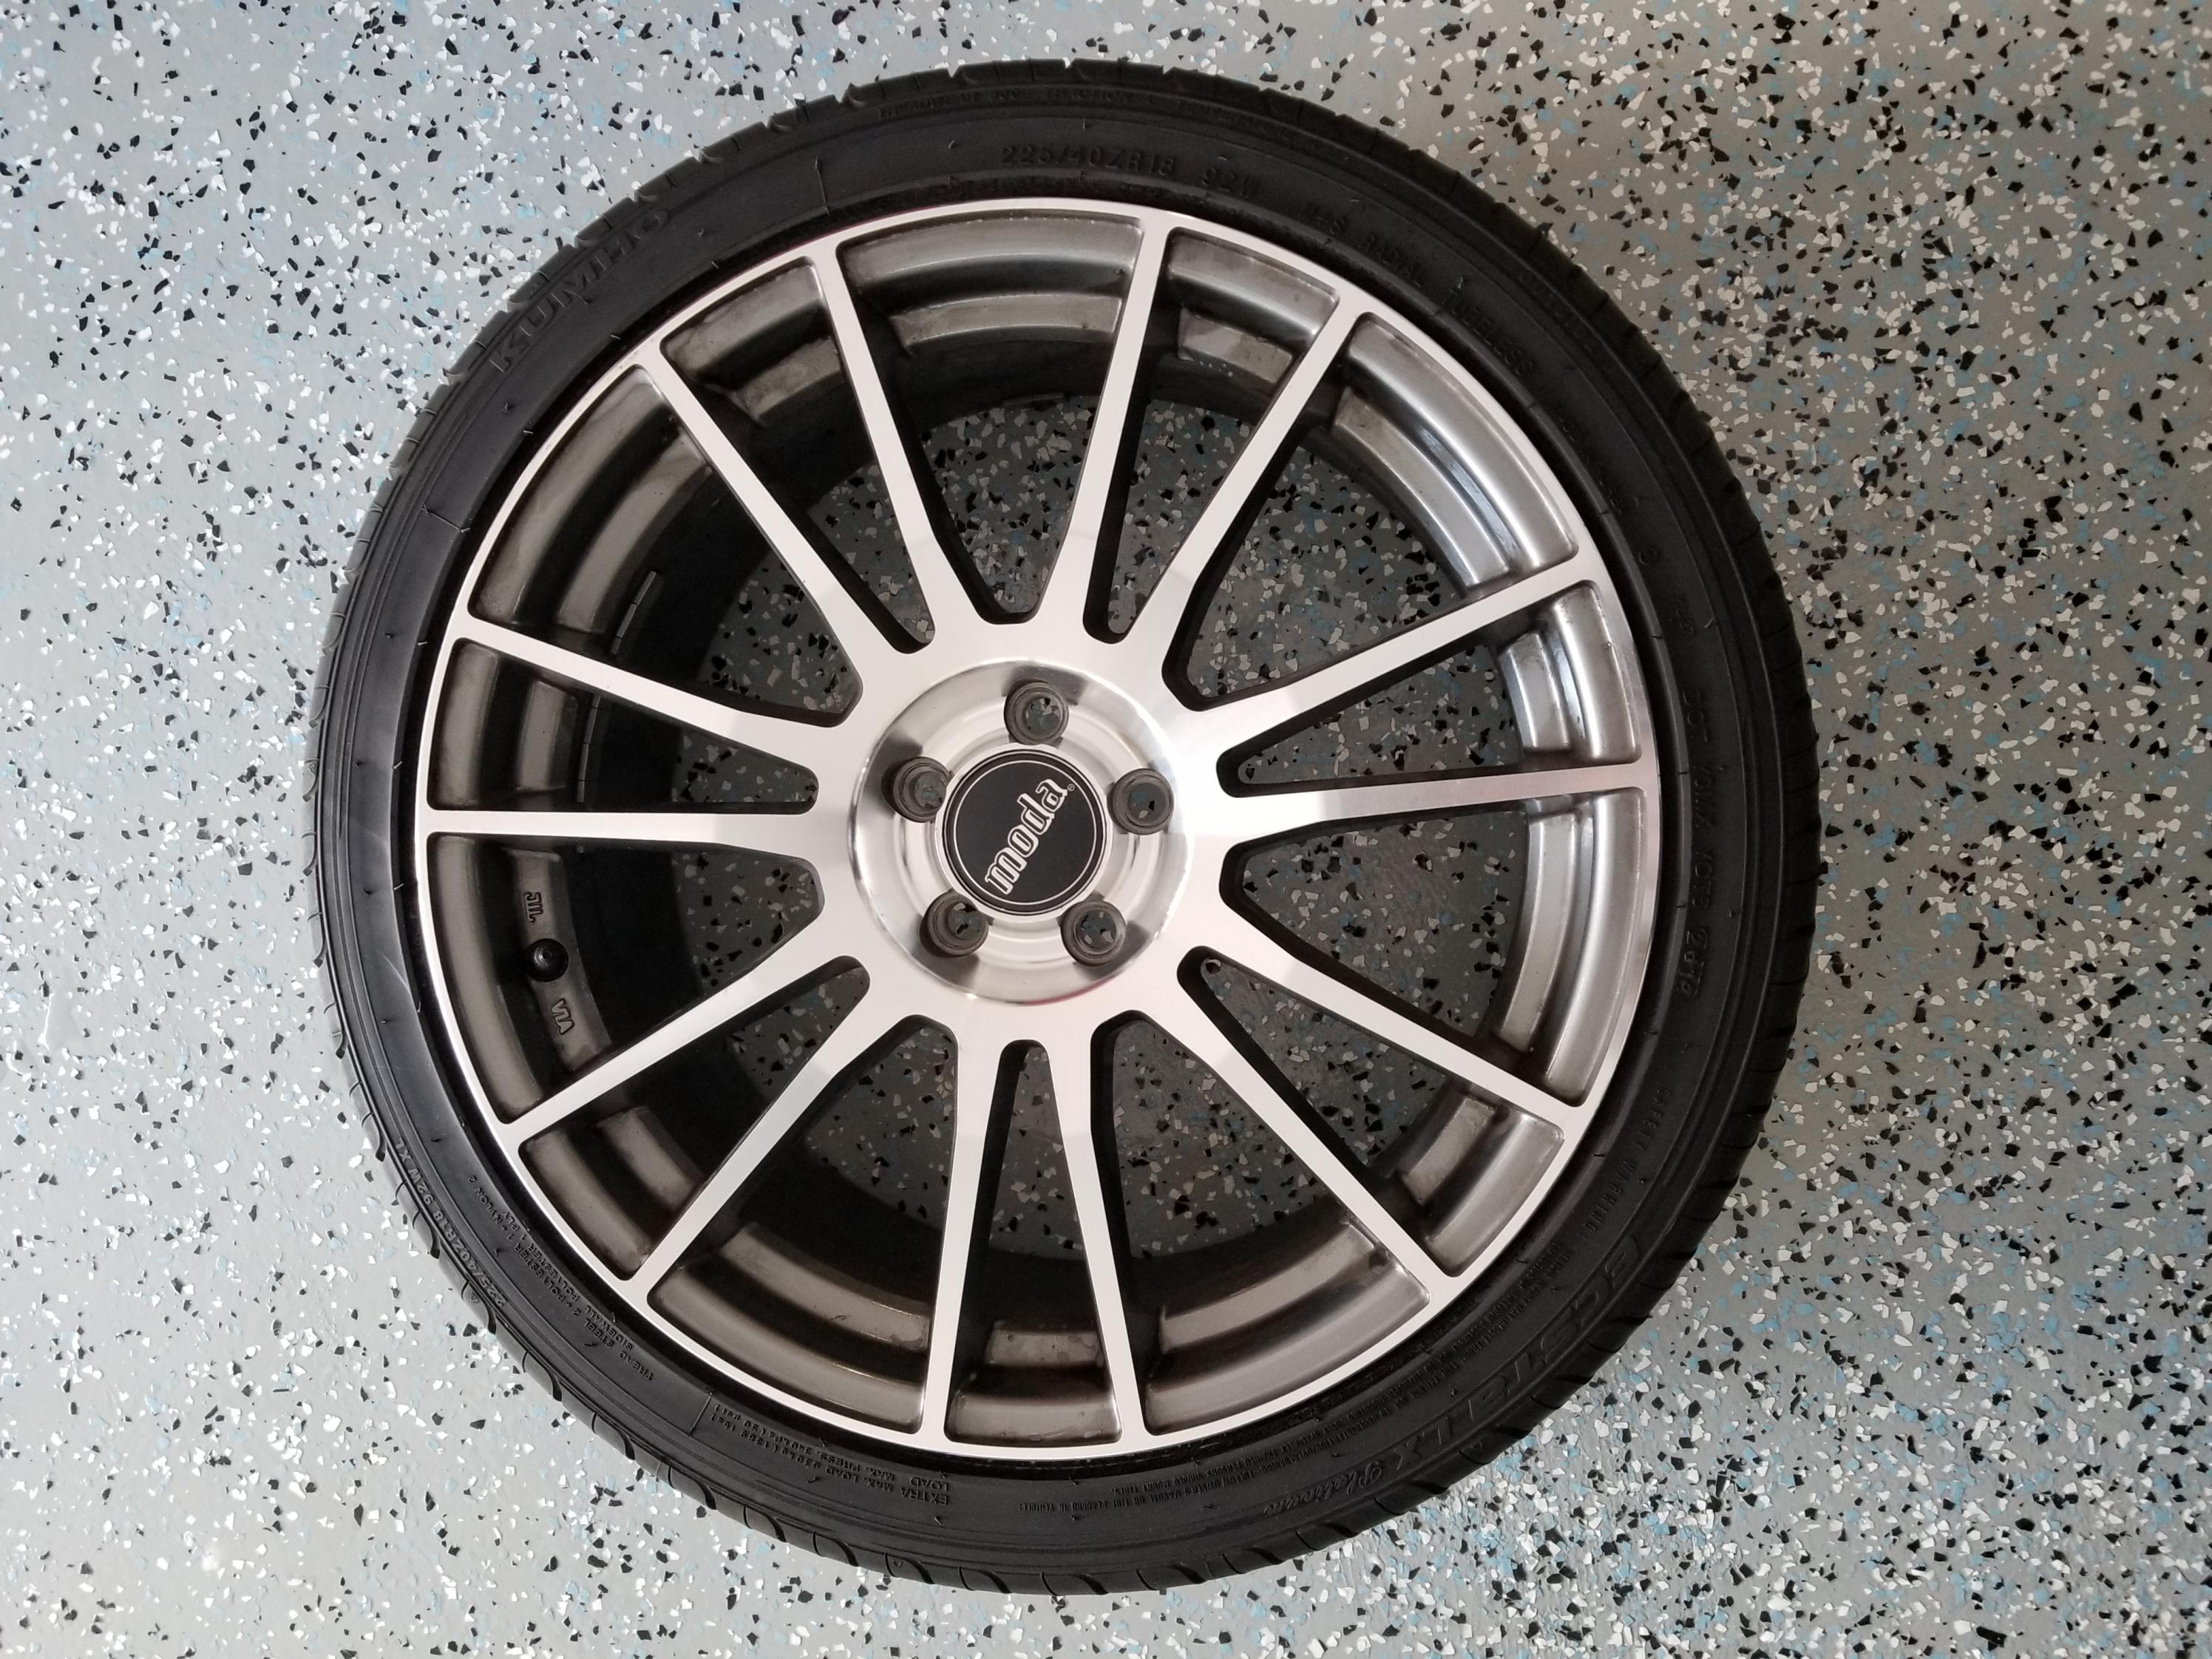 Moda MD20 18x8 with Kumo tires (like new).-20190213_135203-jpg